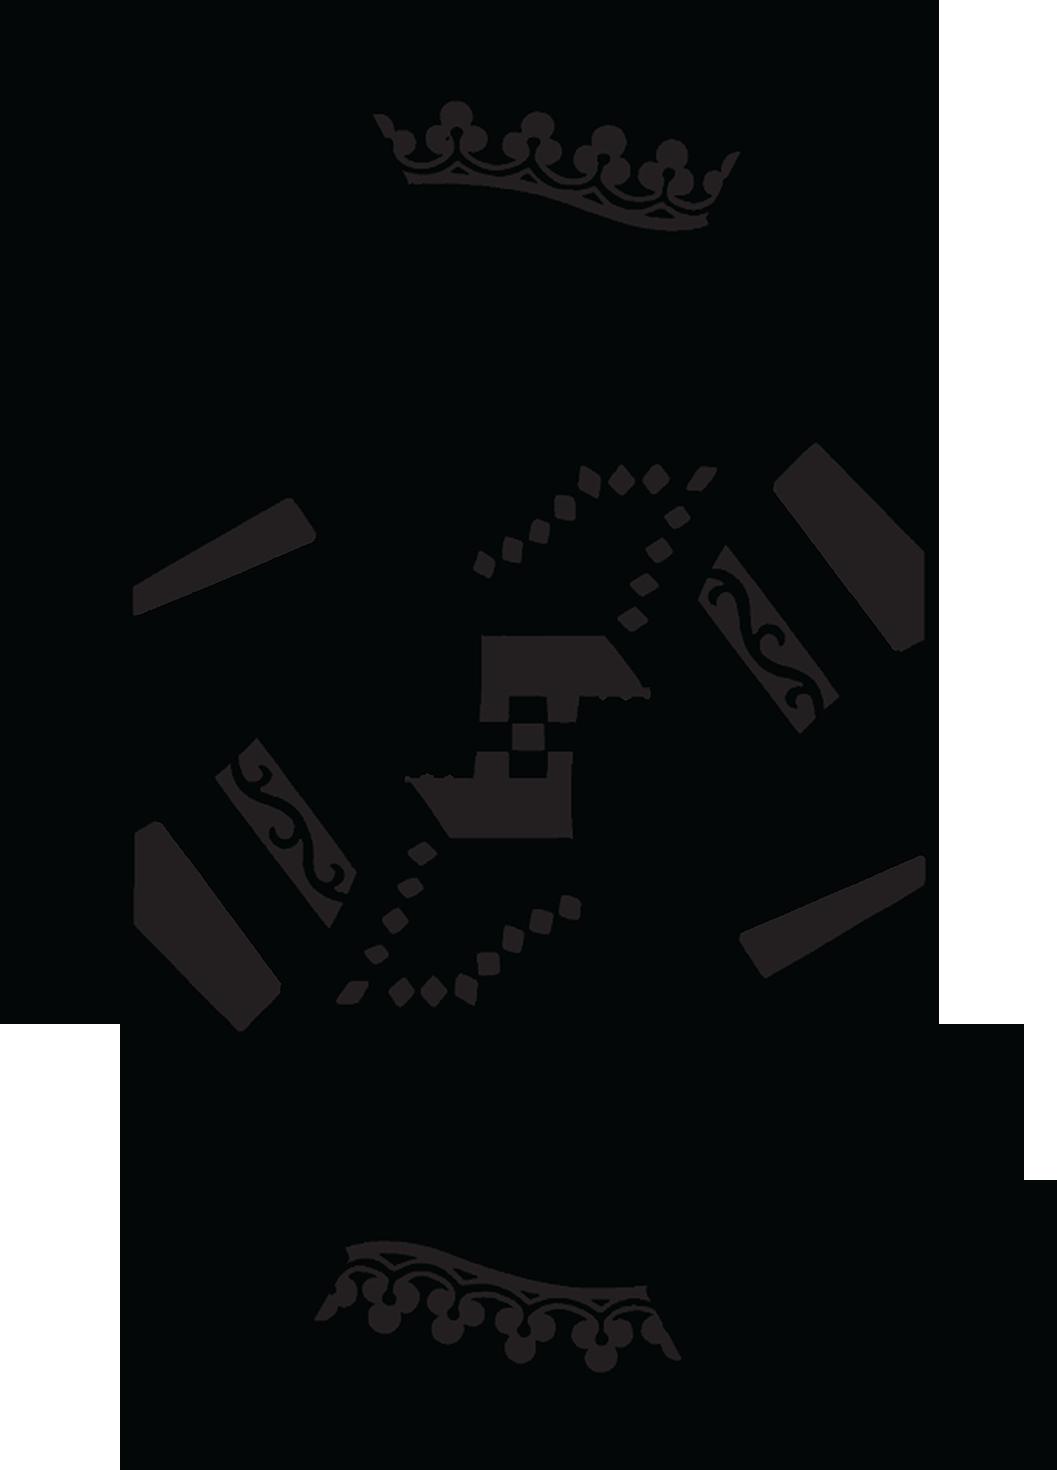 King Card Vector Art Monochrome